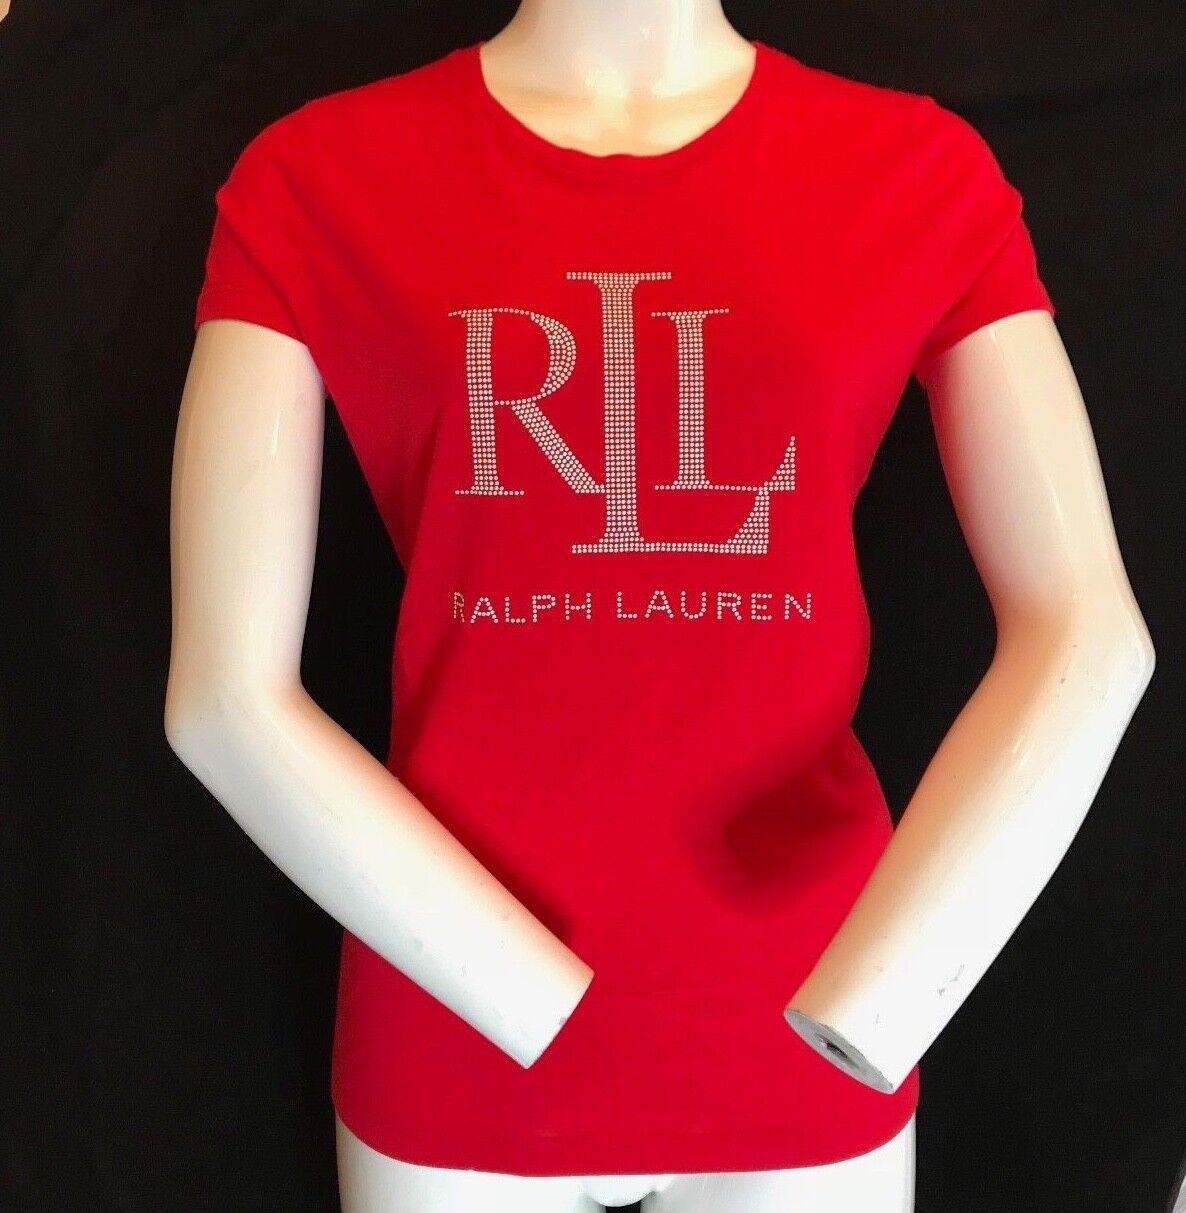 BNWT LAUREN RALPH LAUREN Ladies' New Season LRL Stud Logo rot T Shirt Größe XL